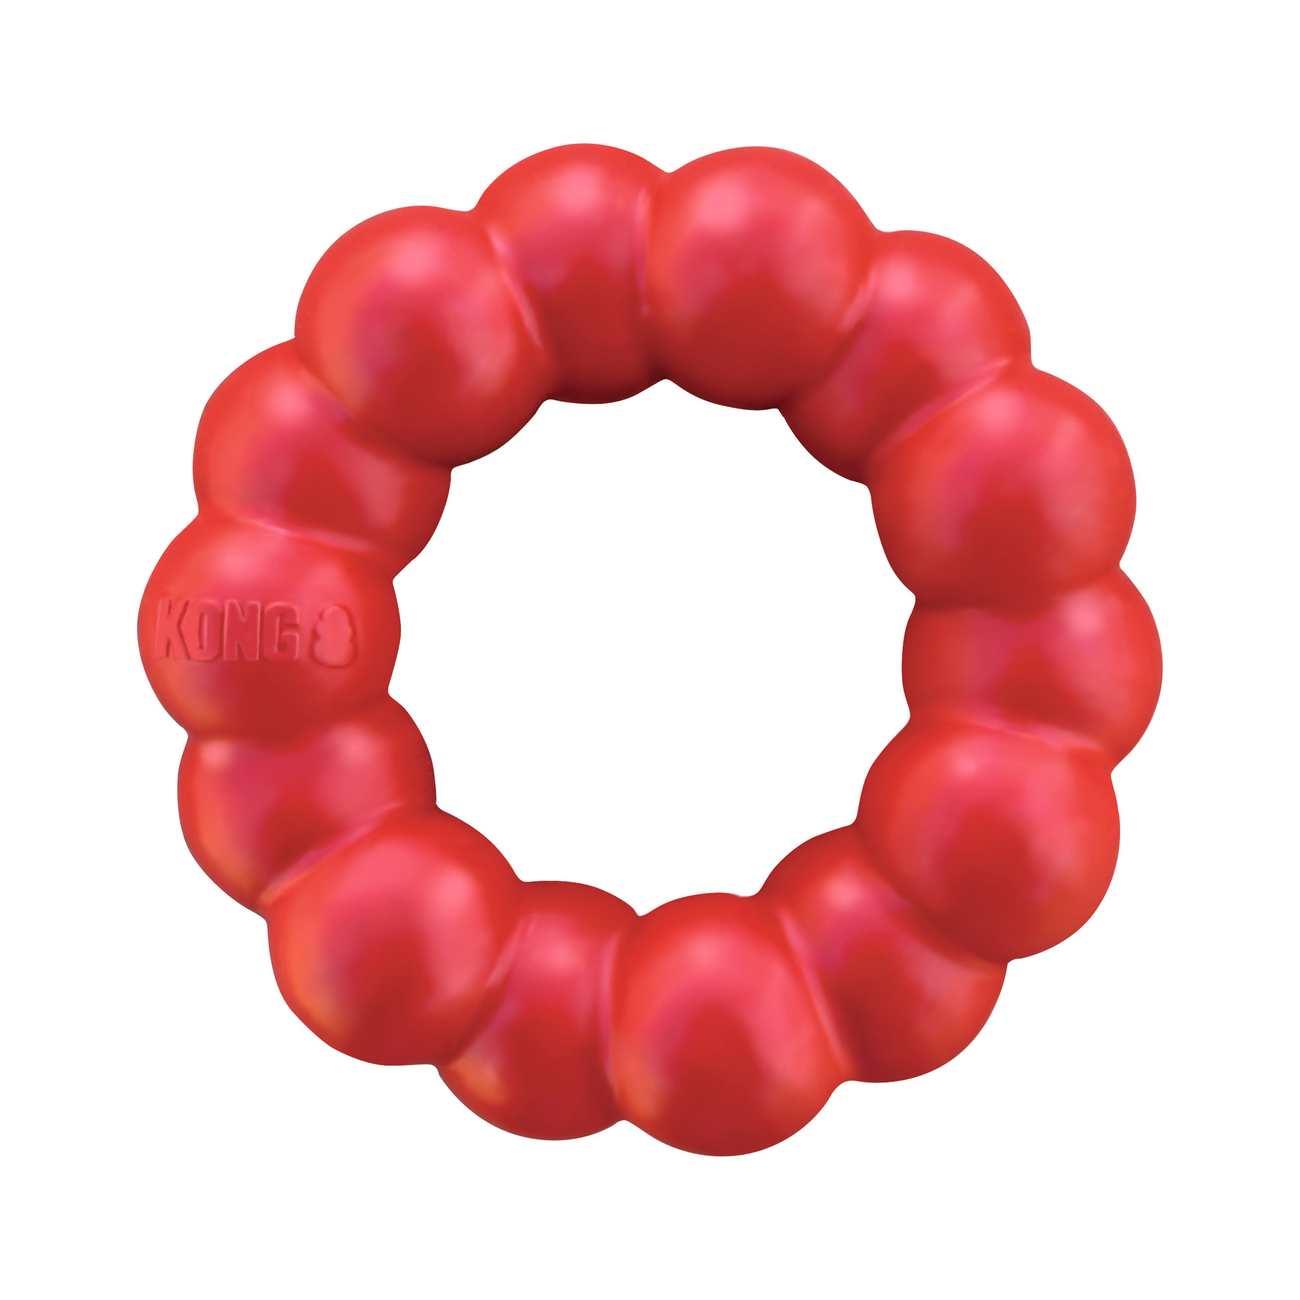 KONG Hundespielzeug Ring